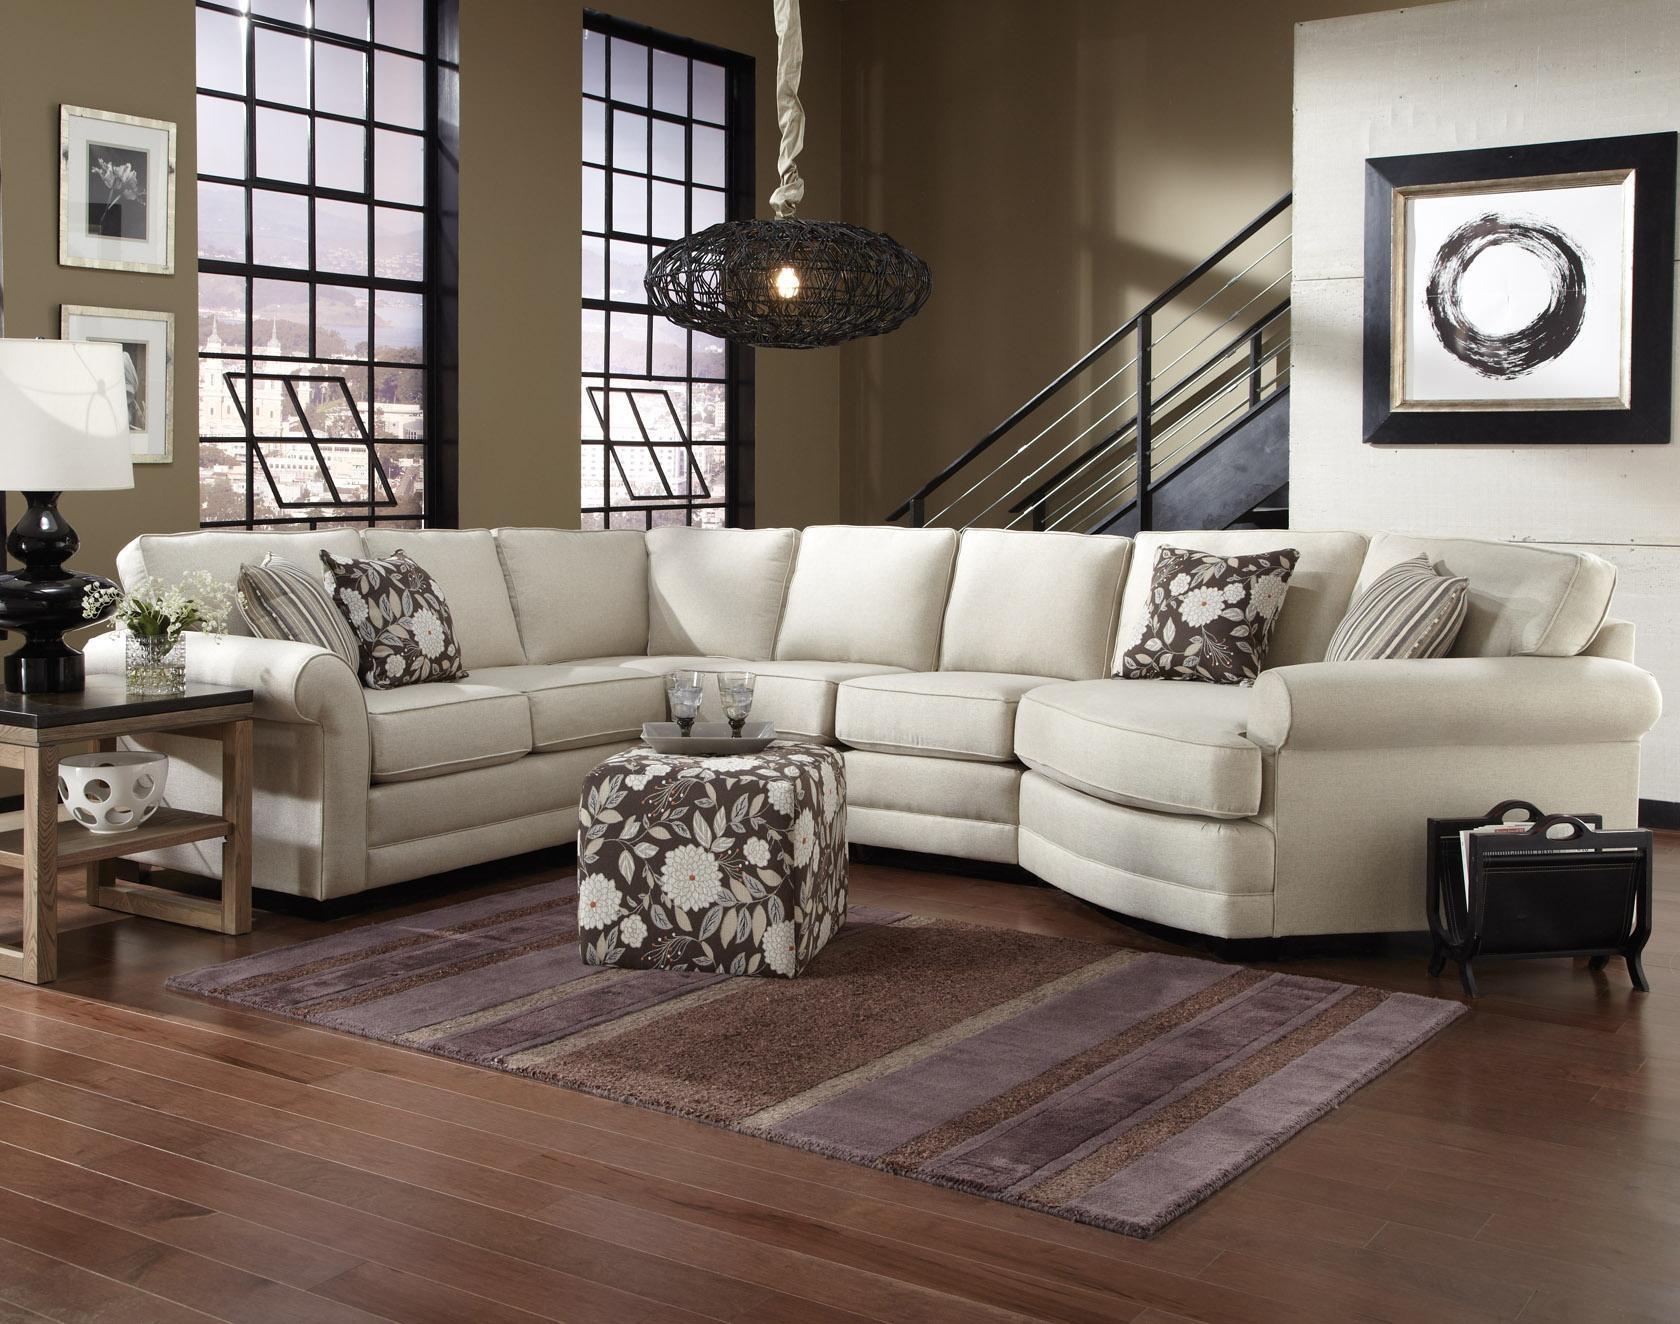 England Brantley 5 Seat Sectional Sofa With Cuddler – Dunk Regarding Cuddler Sectional Sofa (View 7 of 15)